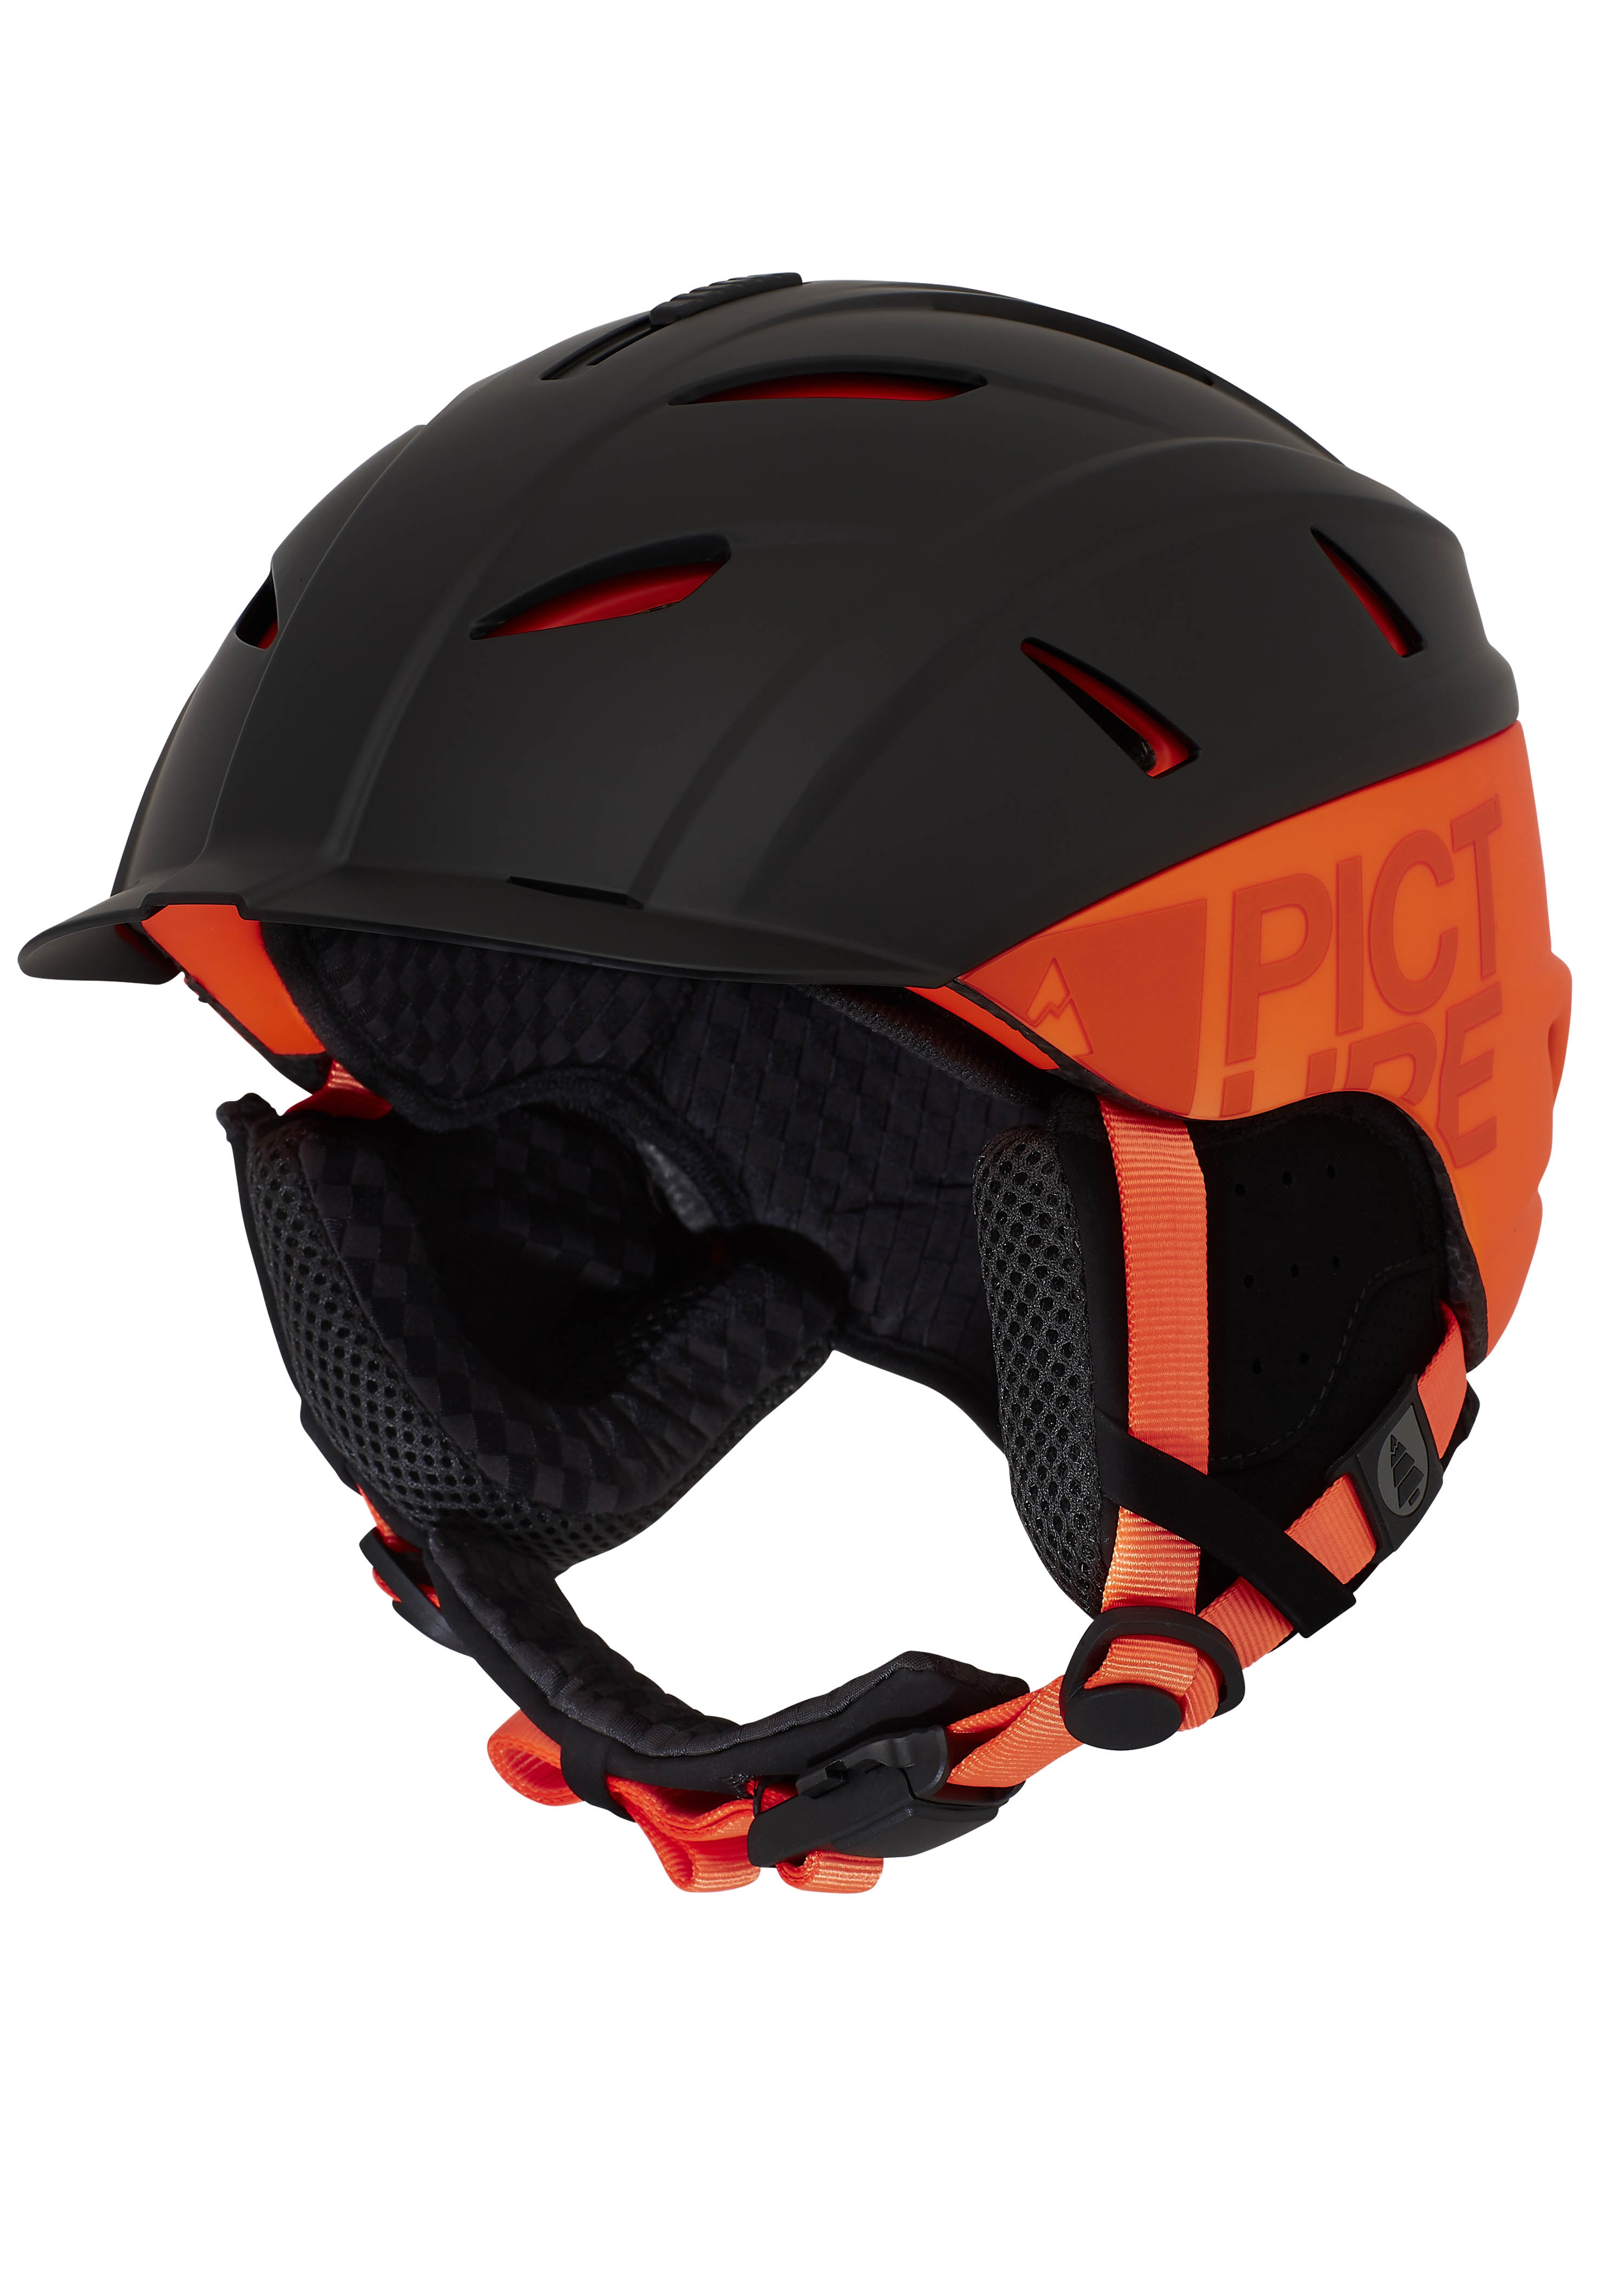 Orange Picture Casque Omega Helmet De Ski cR5A4qSj3L